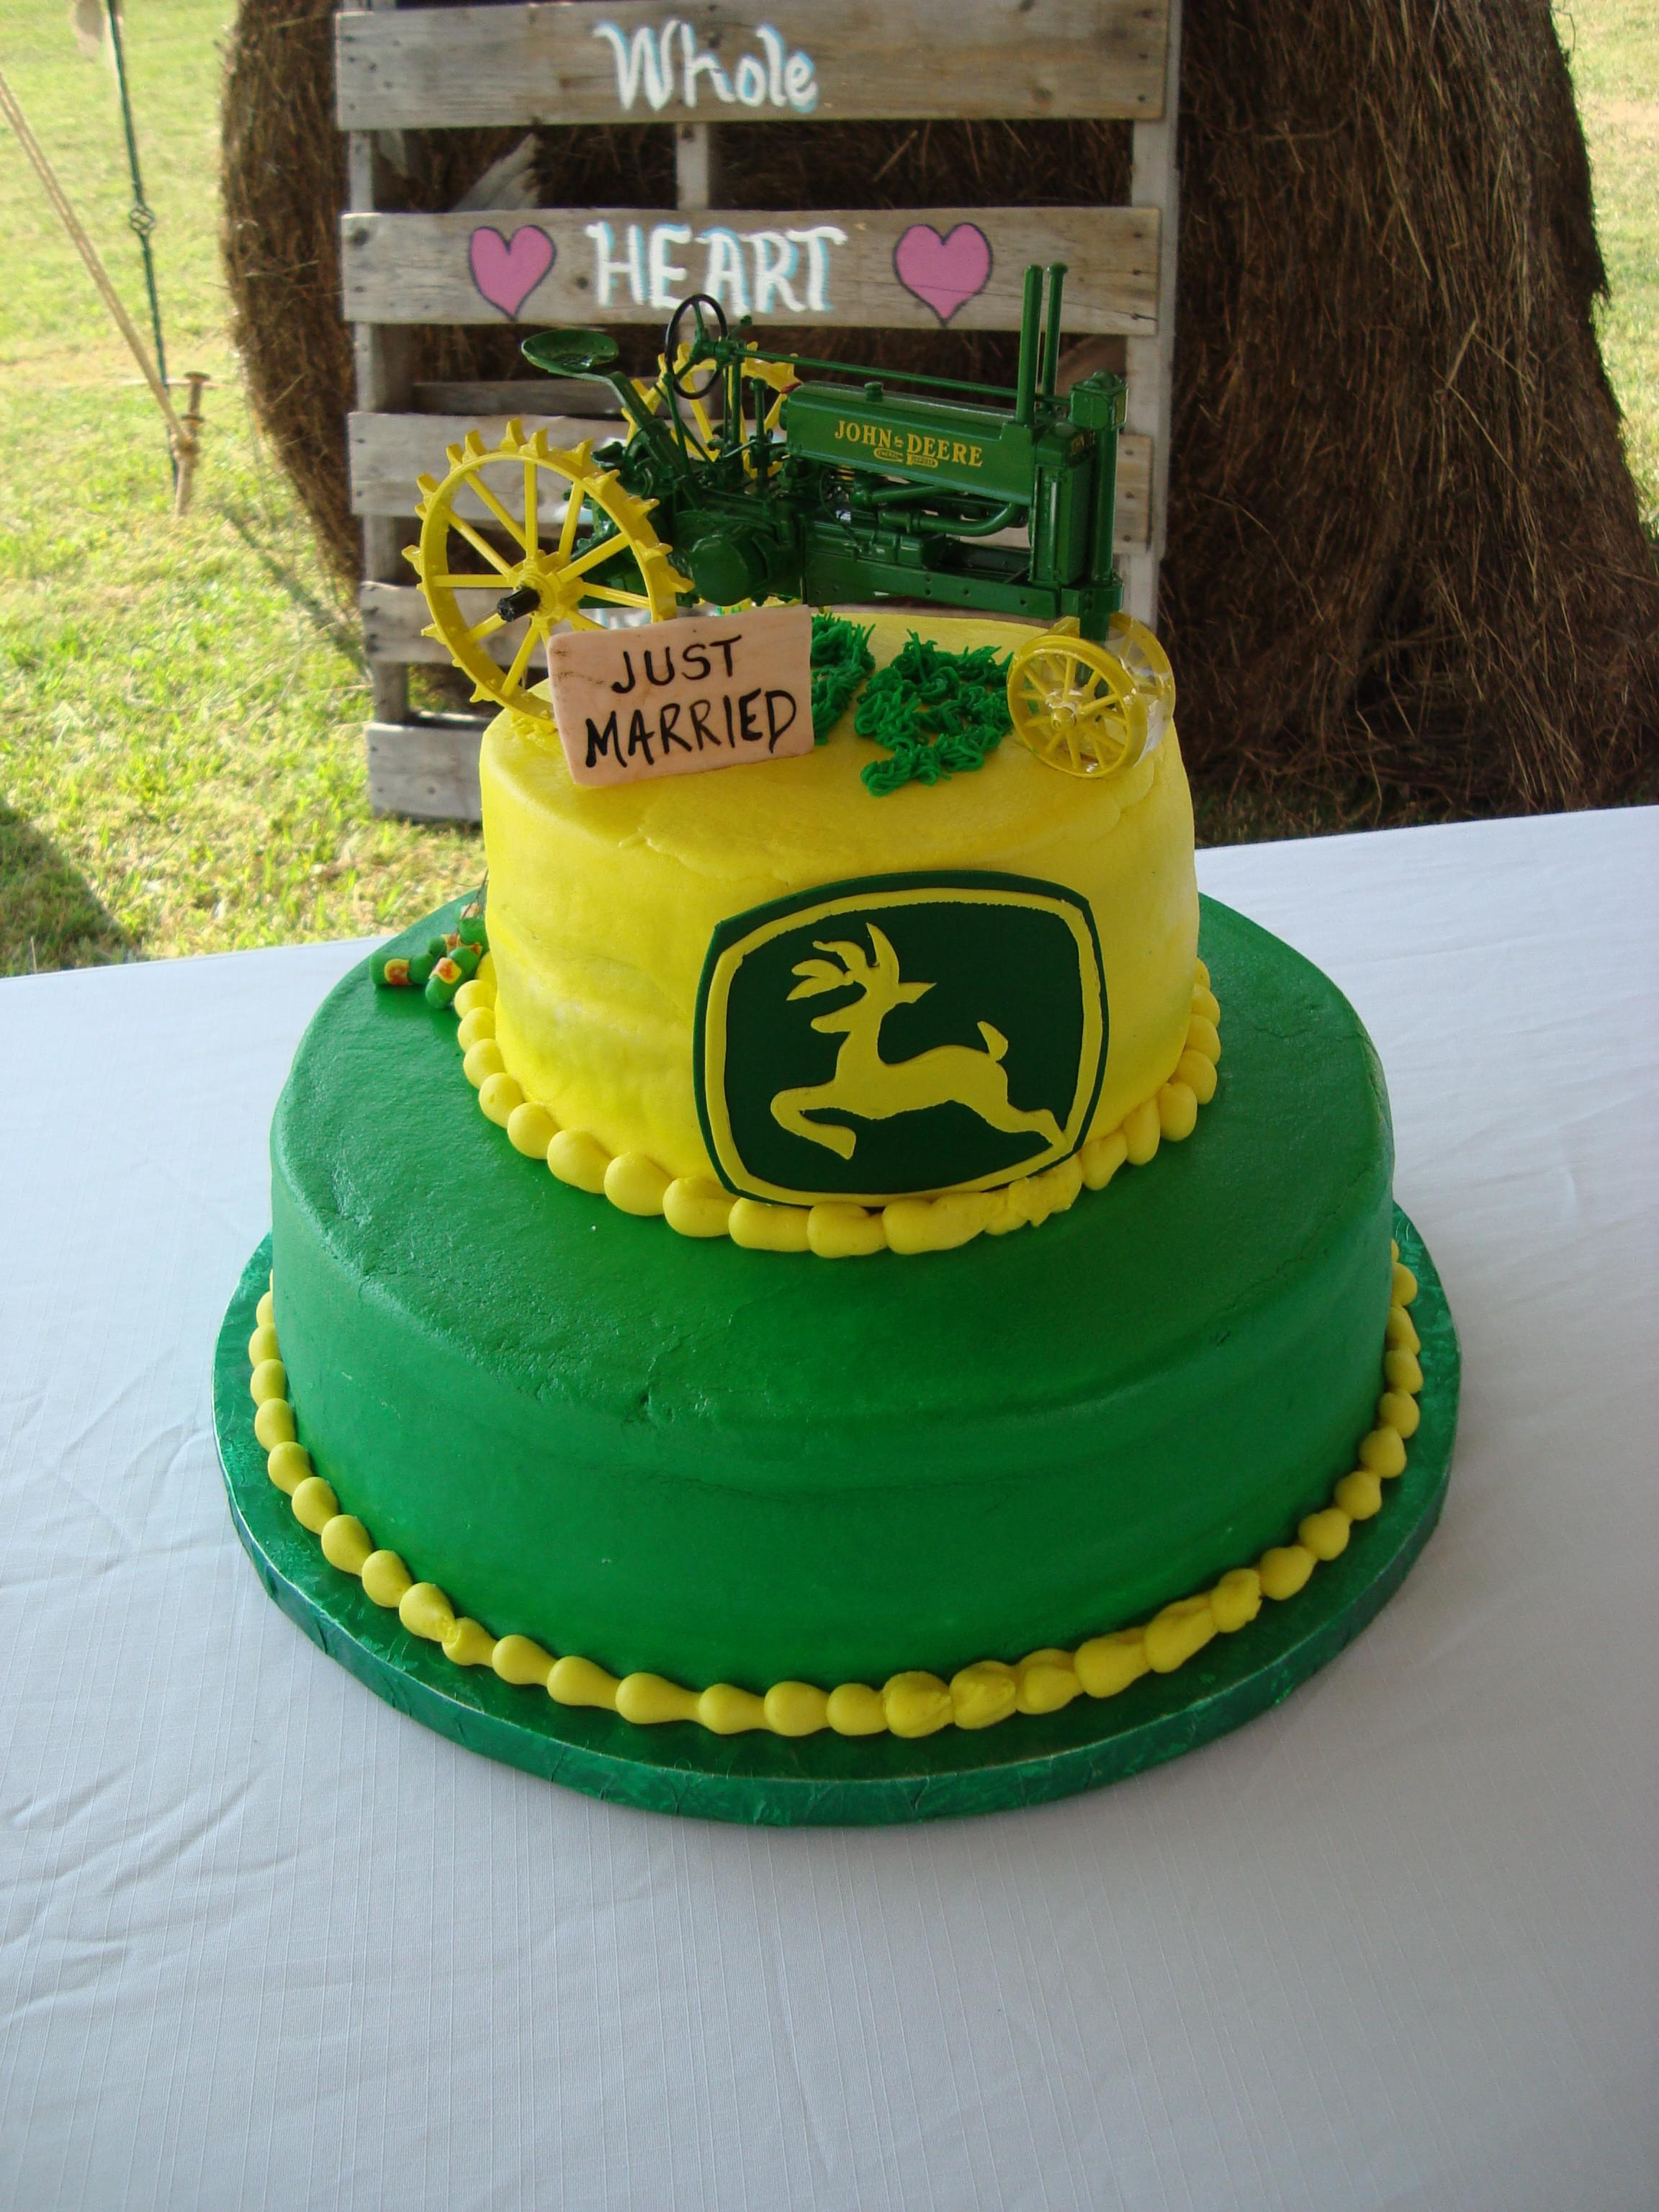 John Deere Wedding Cakes  John deere wedding cakes idea in 2017